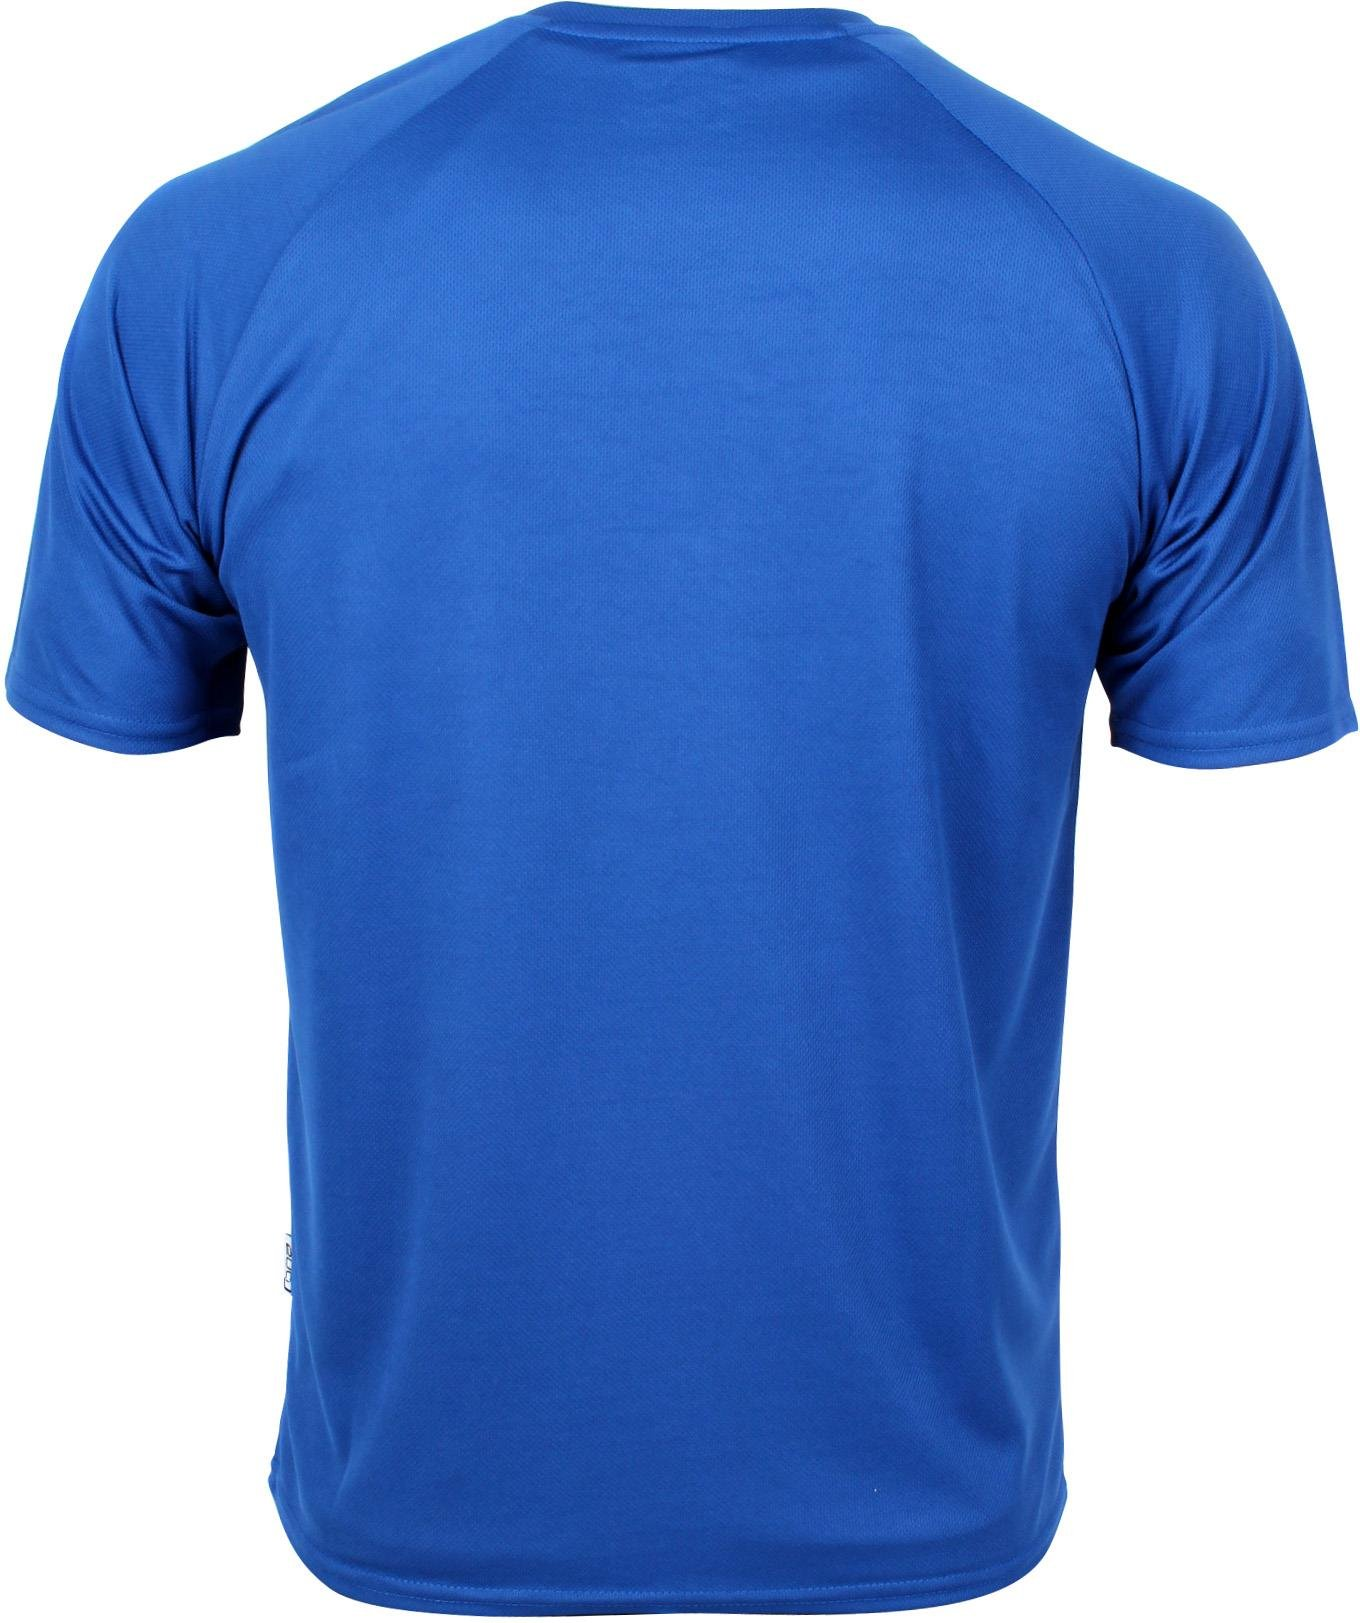 Basic Funktions - Sport T-Shirt in vielen Farben Farbe Royal Blue Größe L